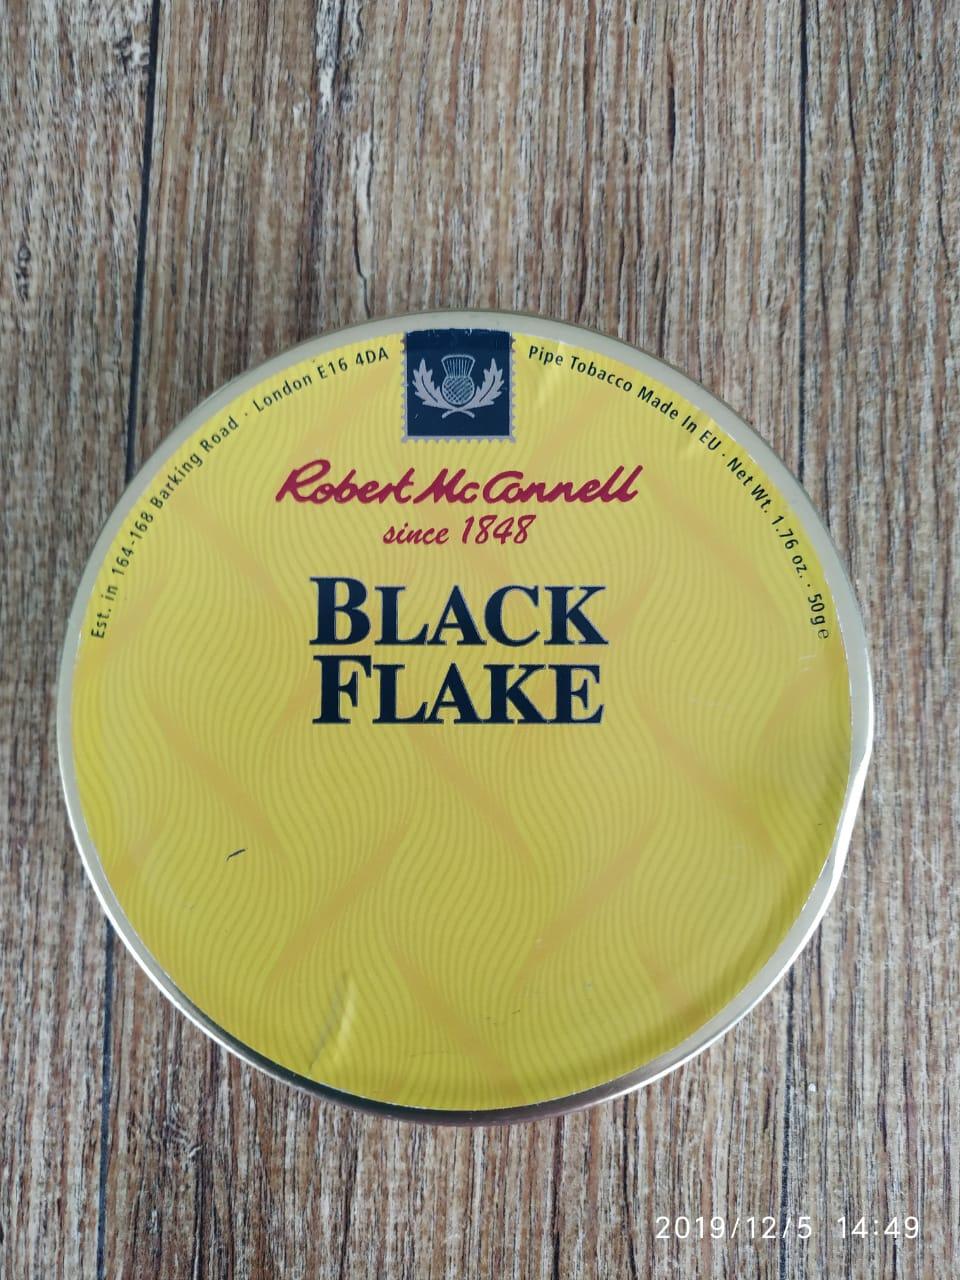 Robert McConnell - Black Flake (Heritage)